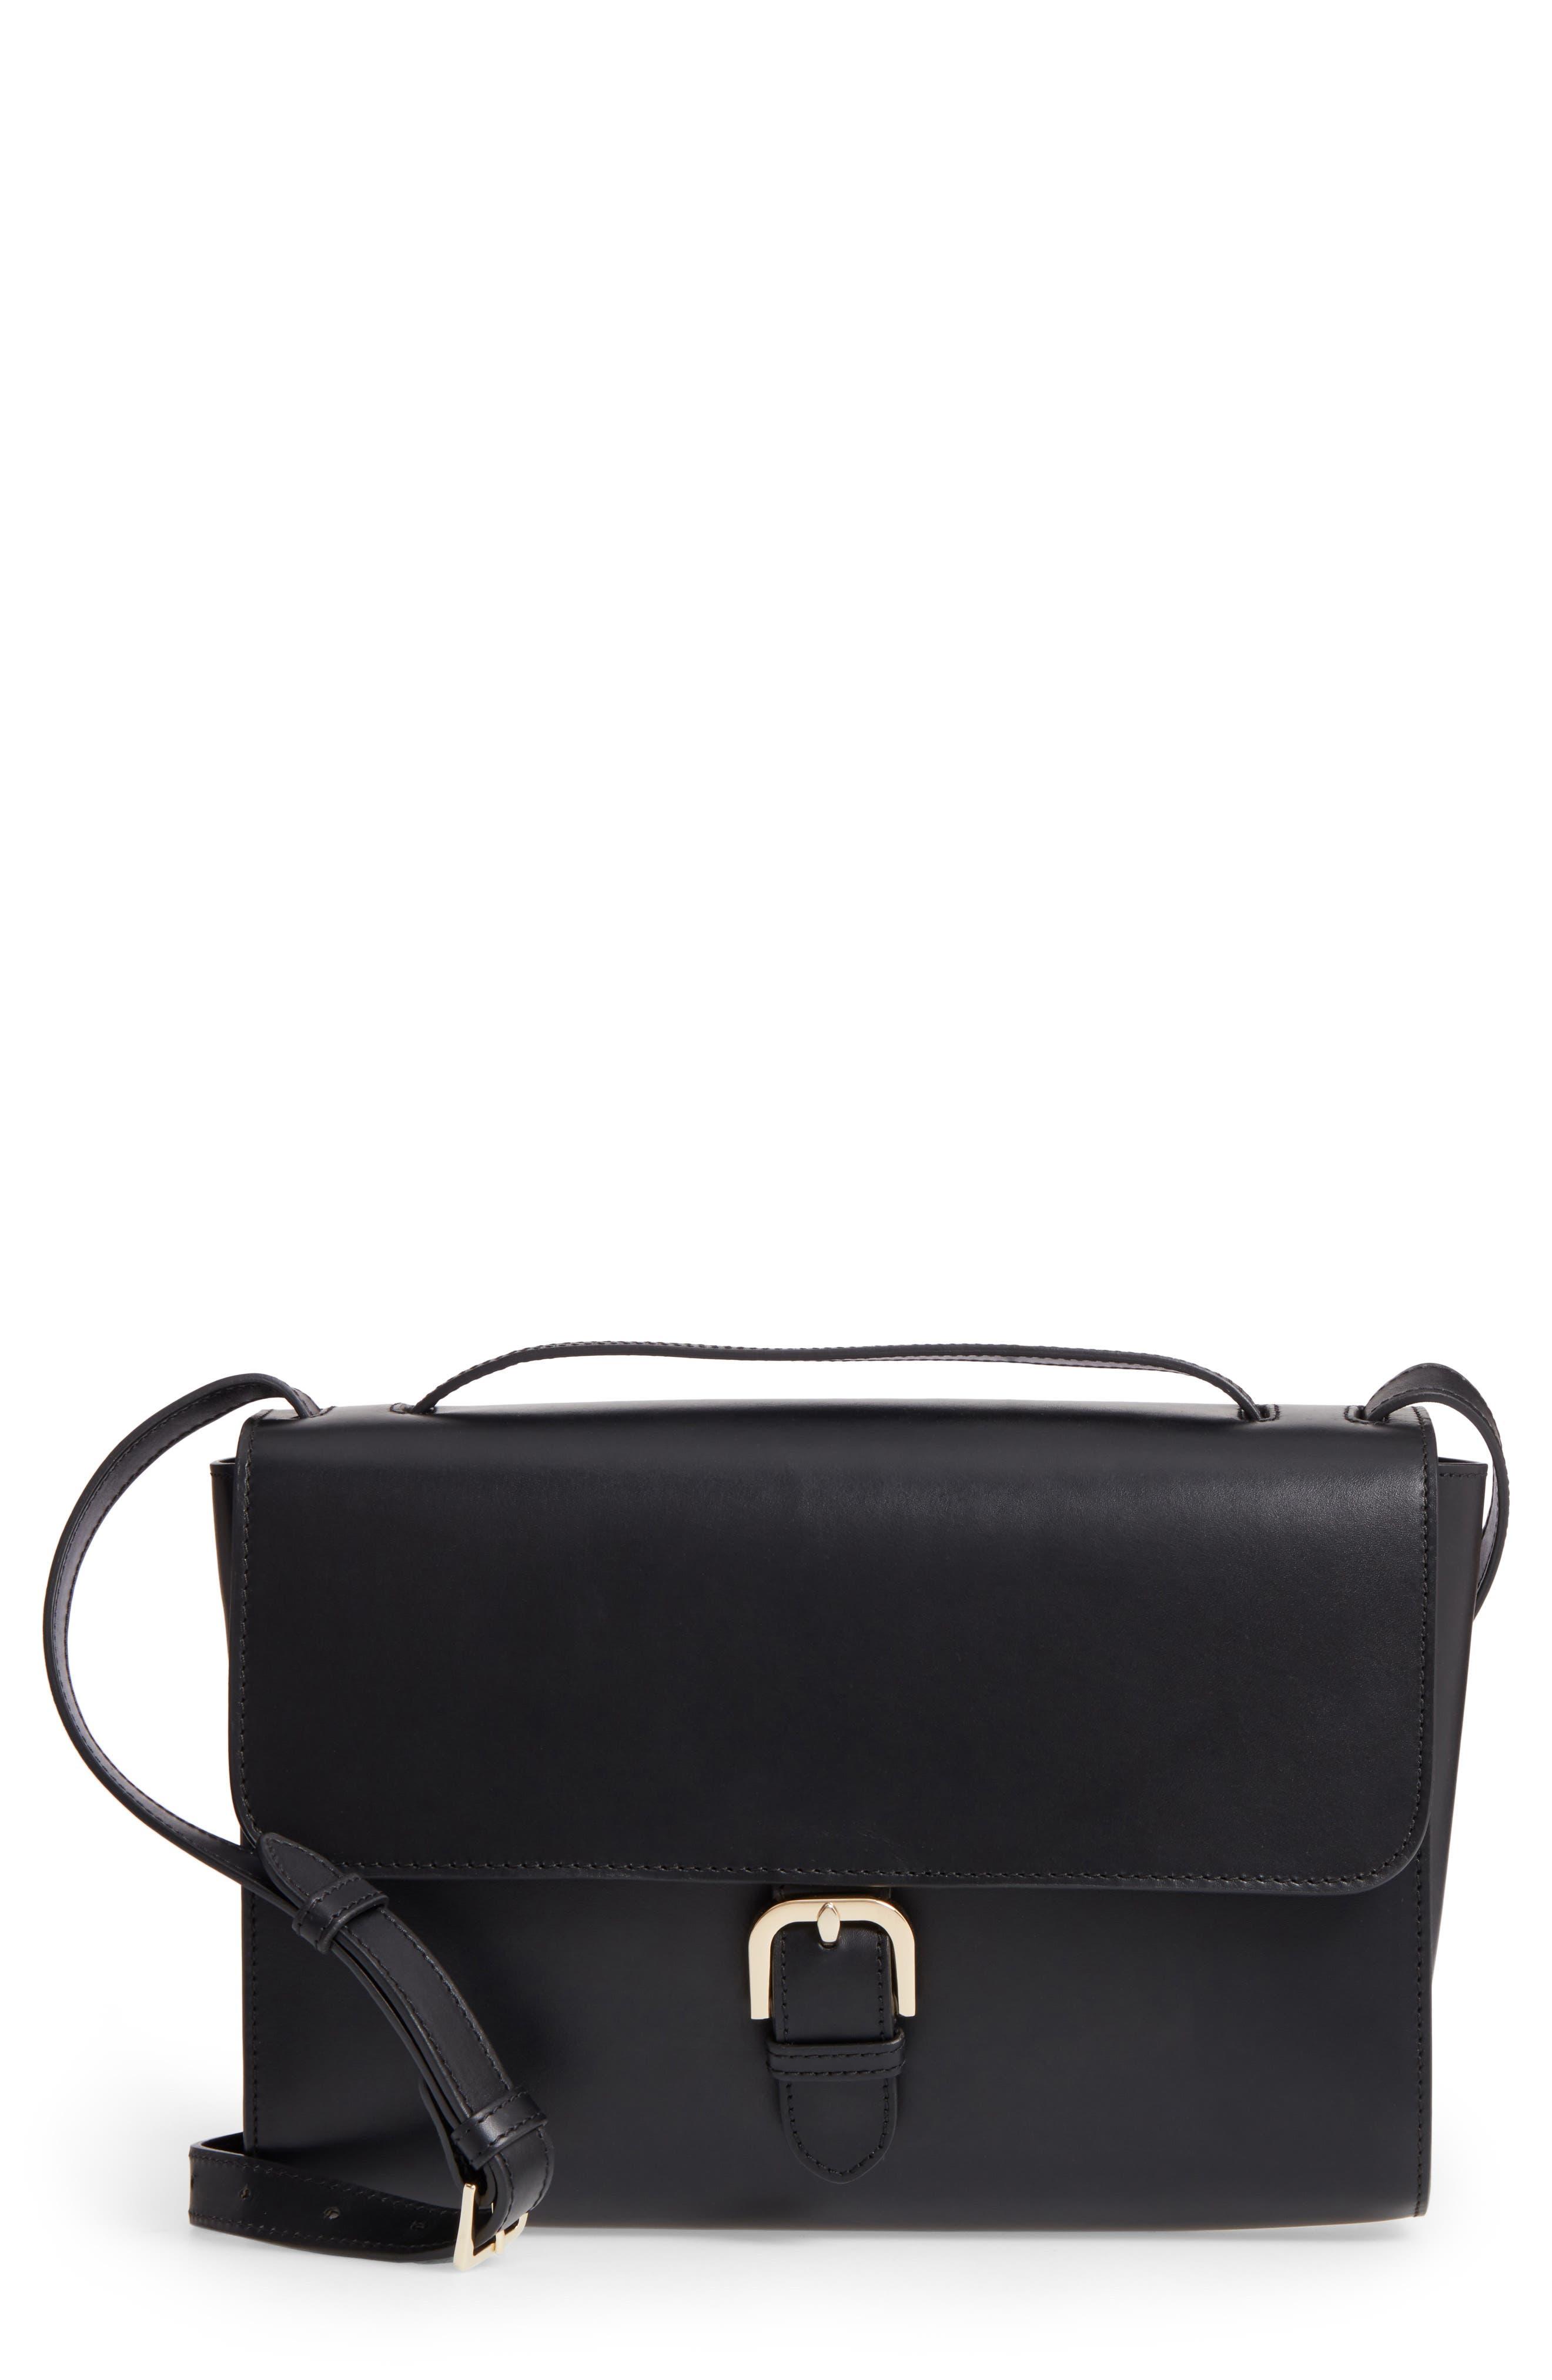 Alternate Image 1 Selected - A.P.C. Katy Calfskin Leather Messenger Bag